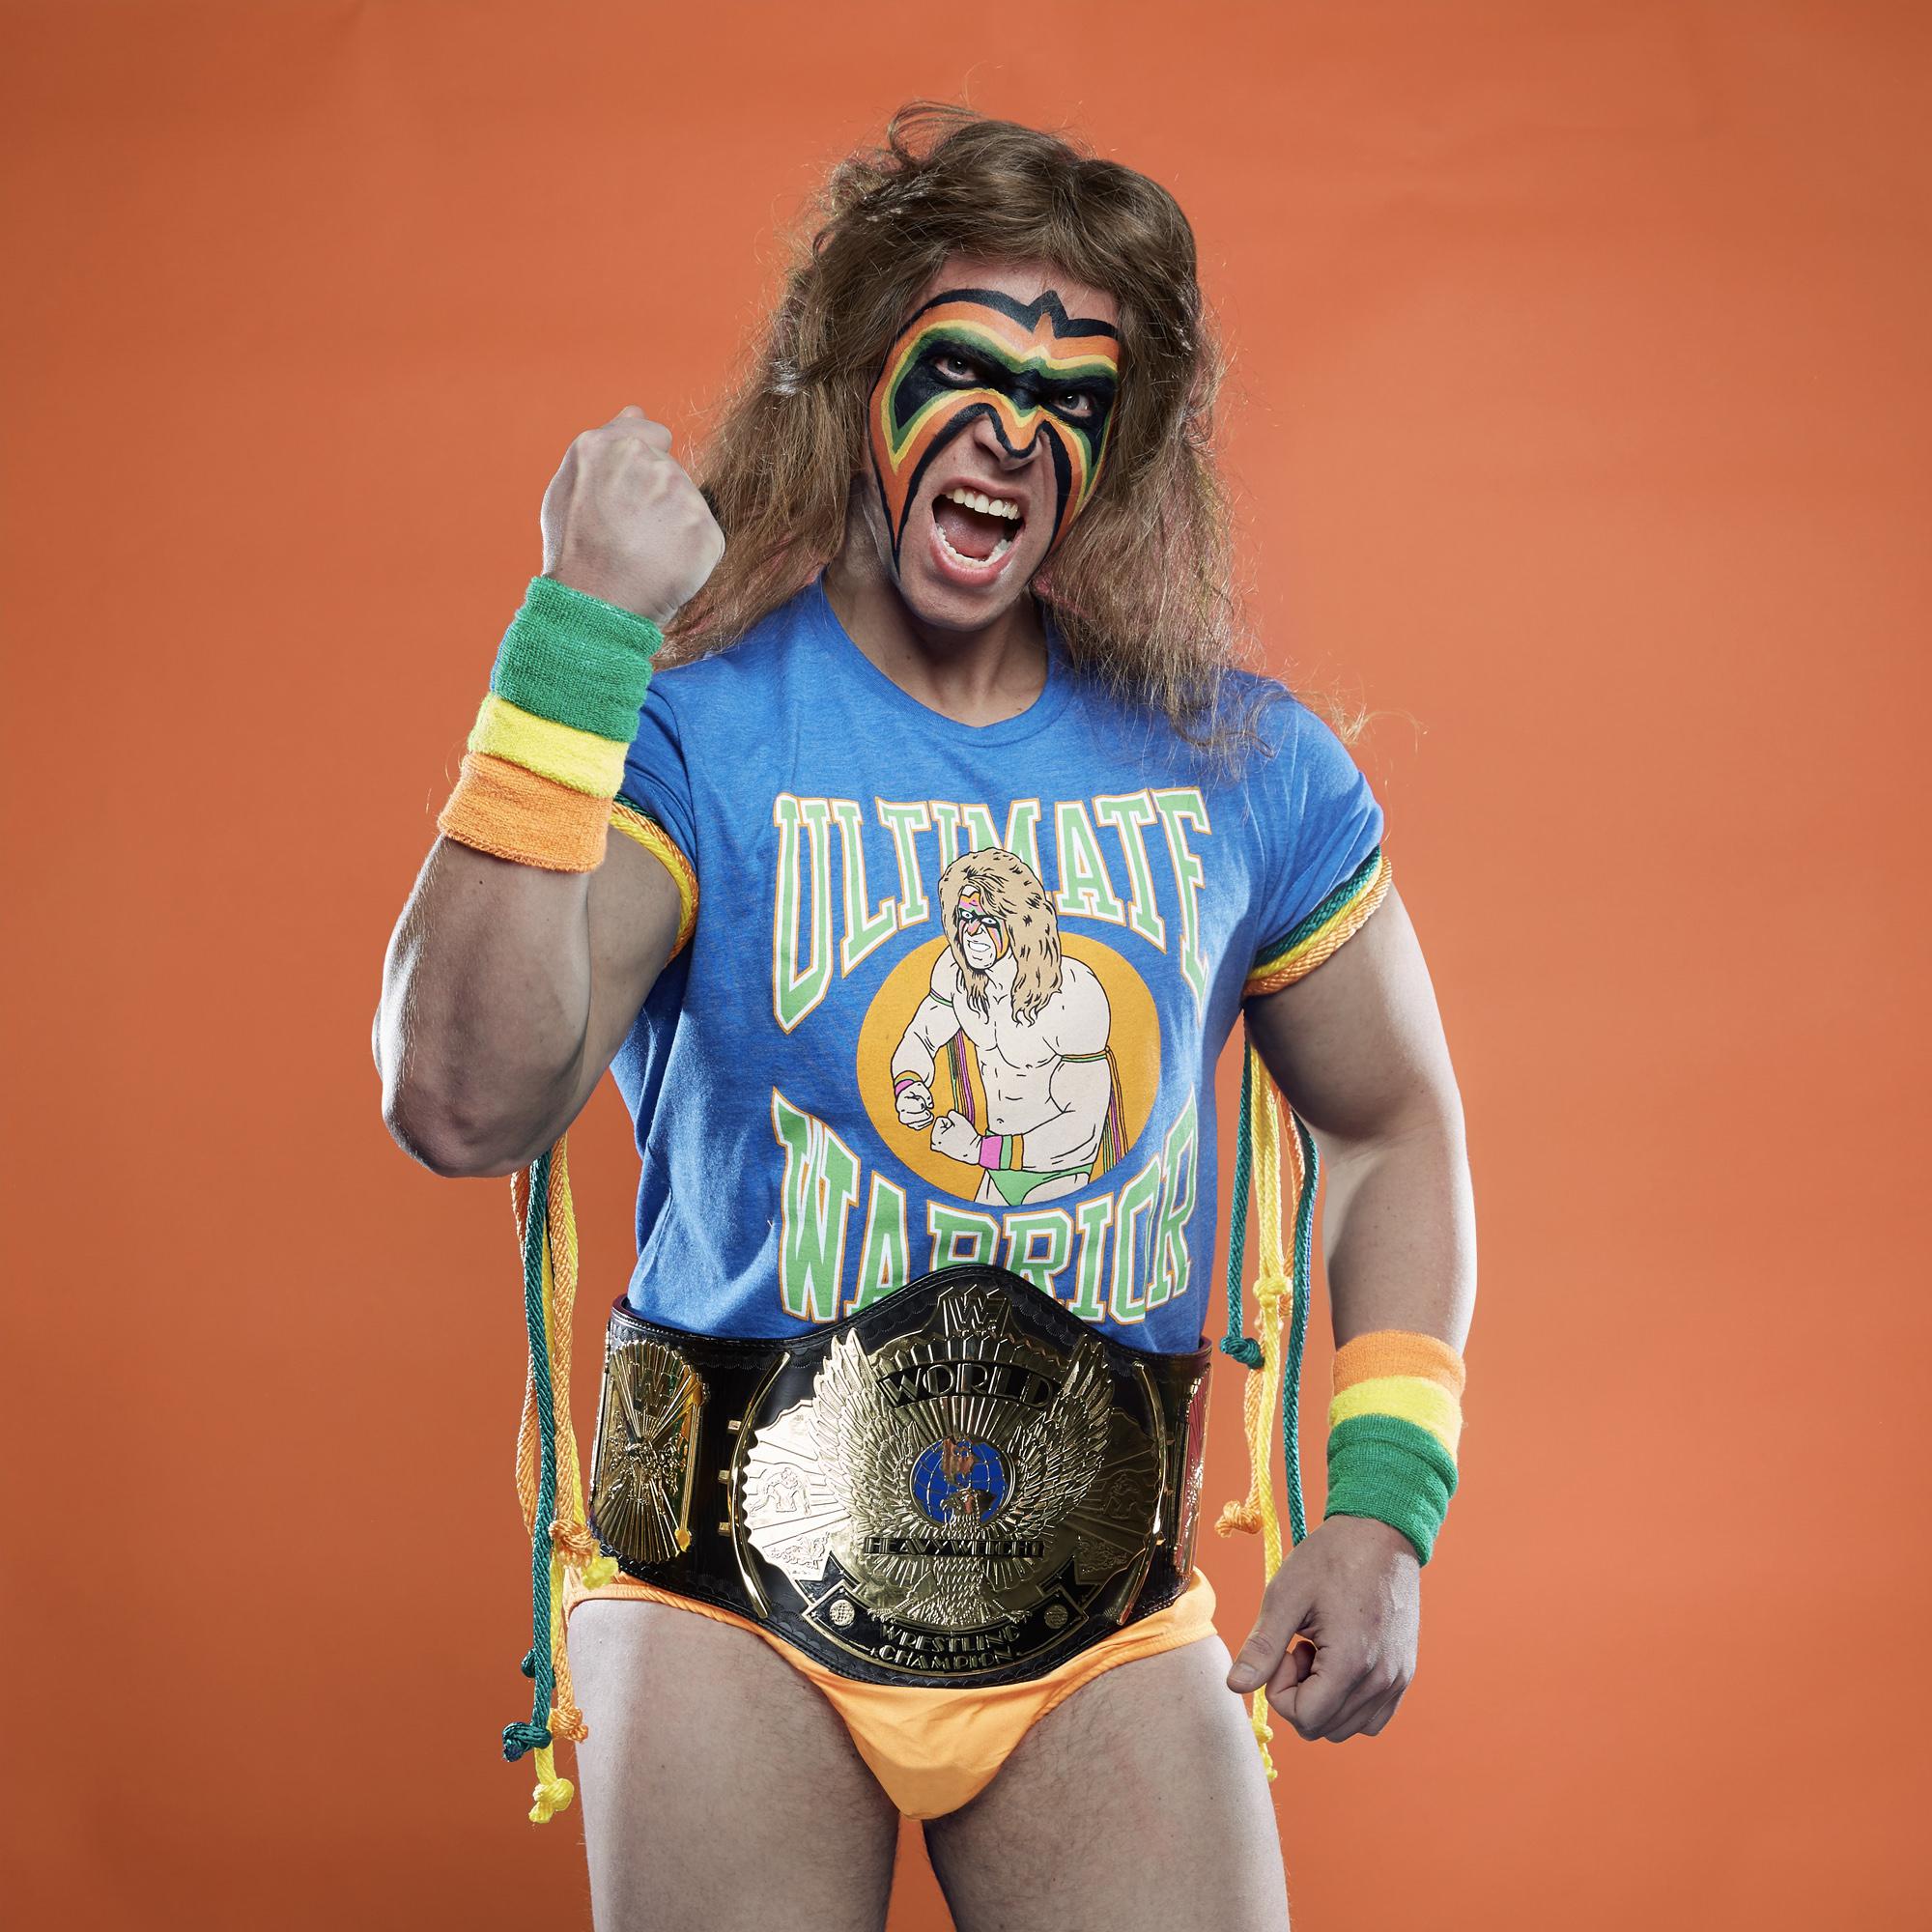 legends-of-the-ring-ultimate-warrior.jpg